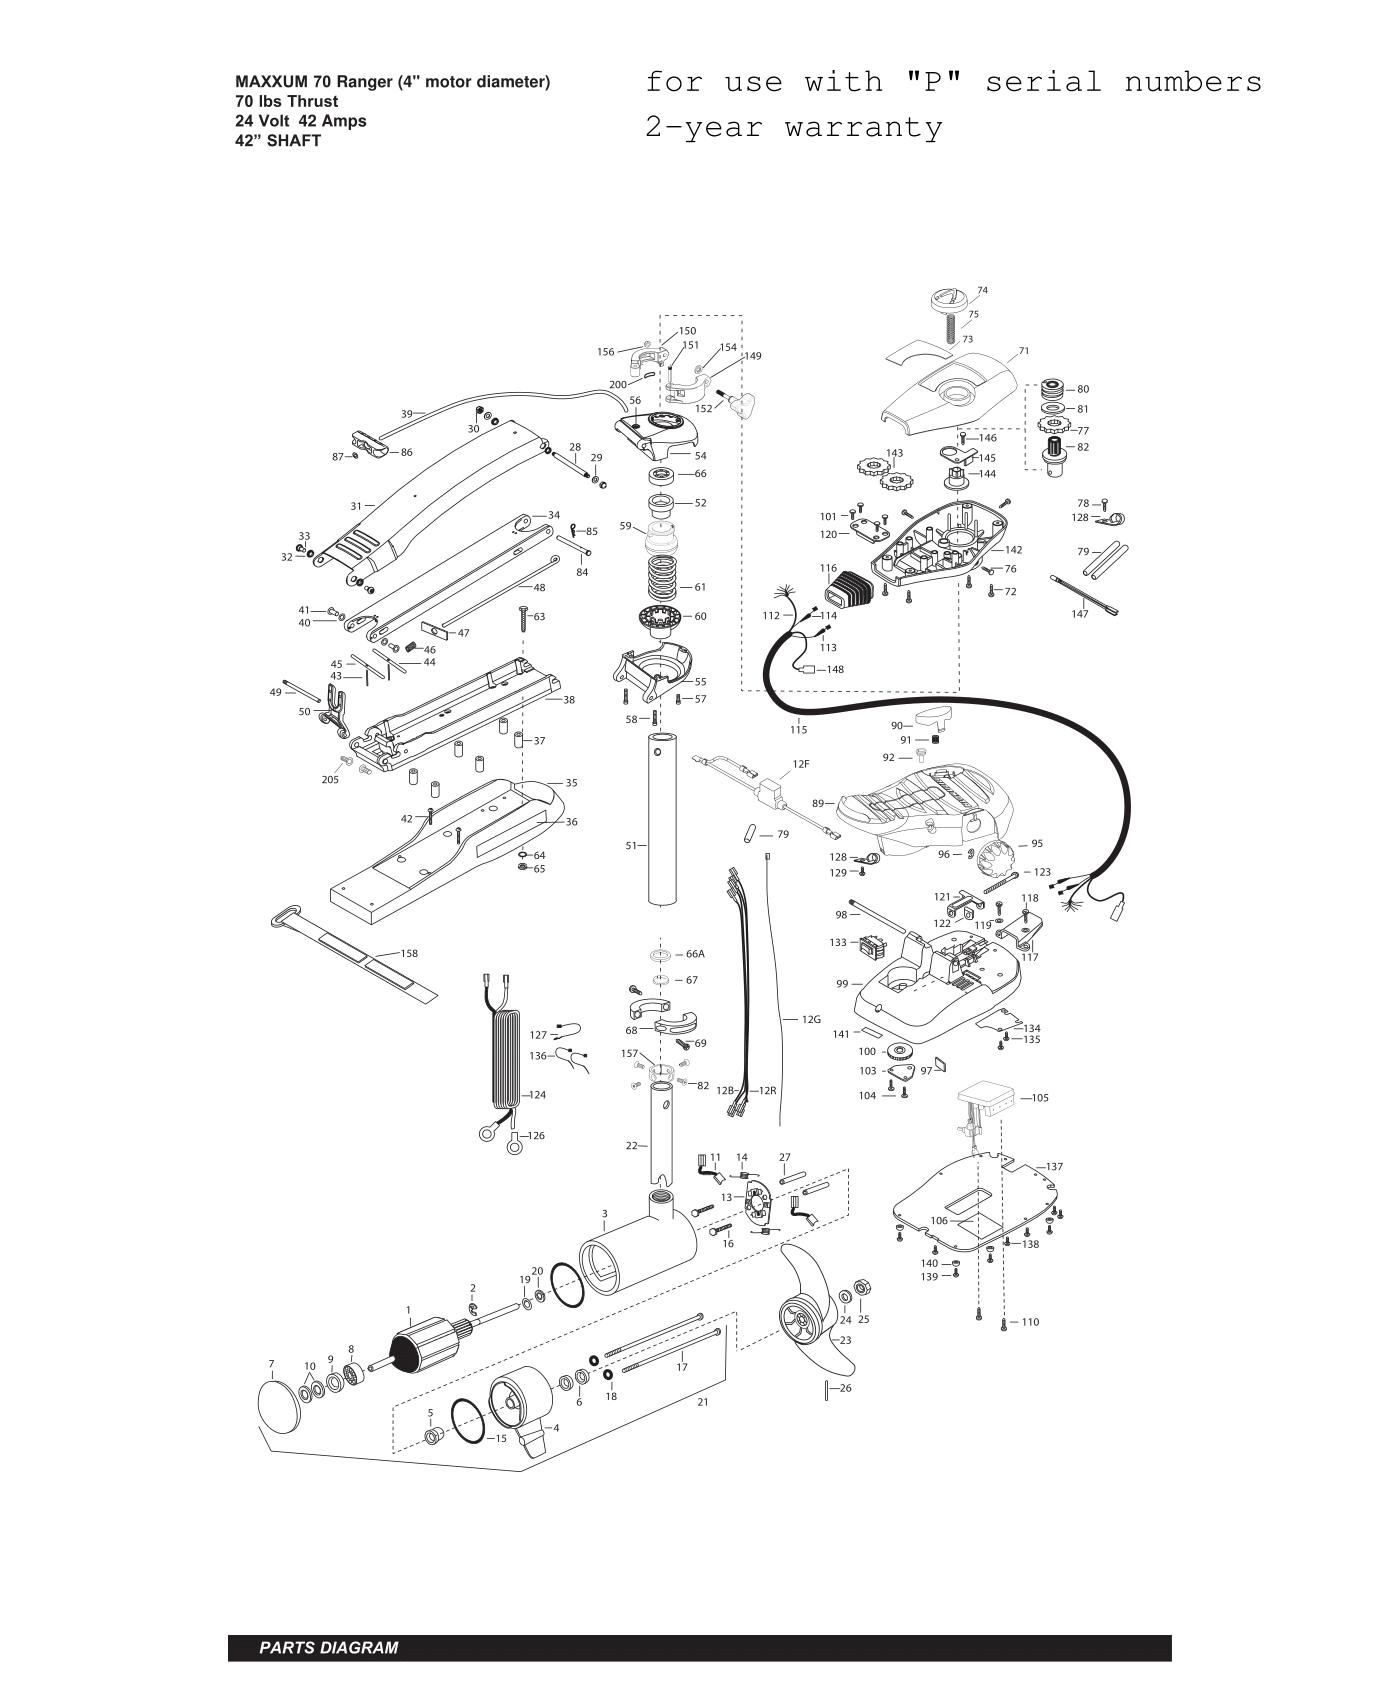 2015-mk-max70ranger-1.png